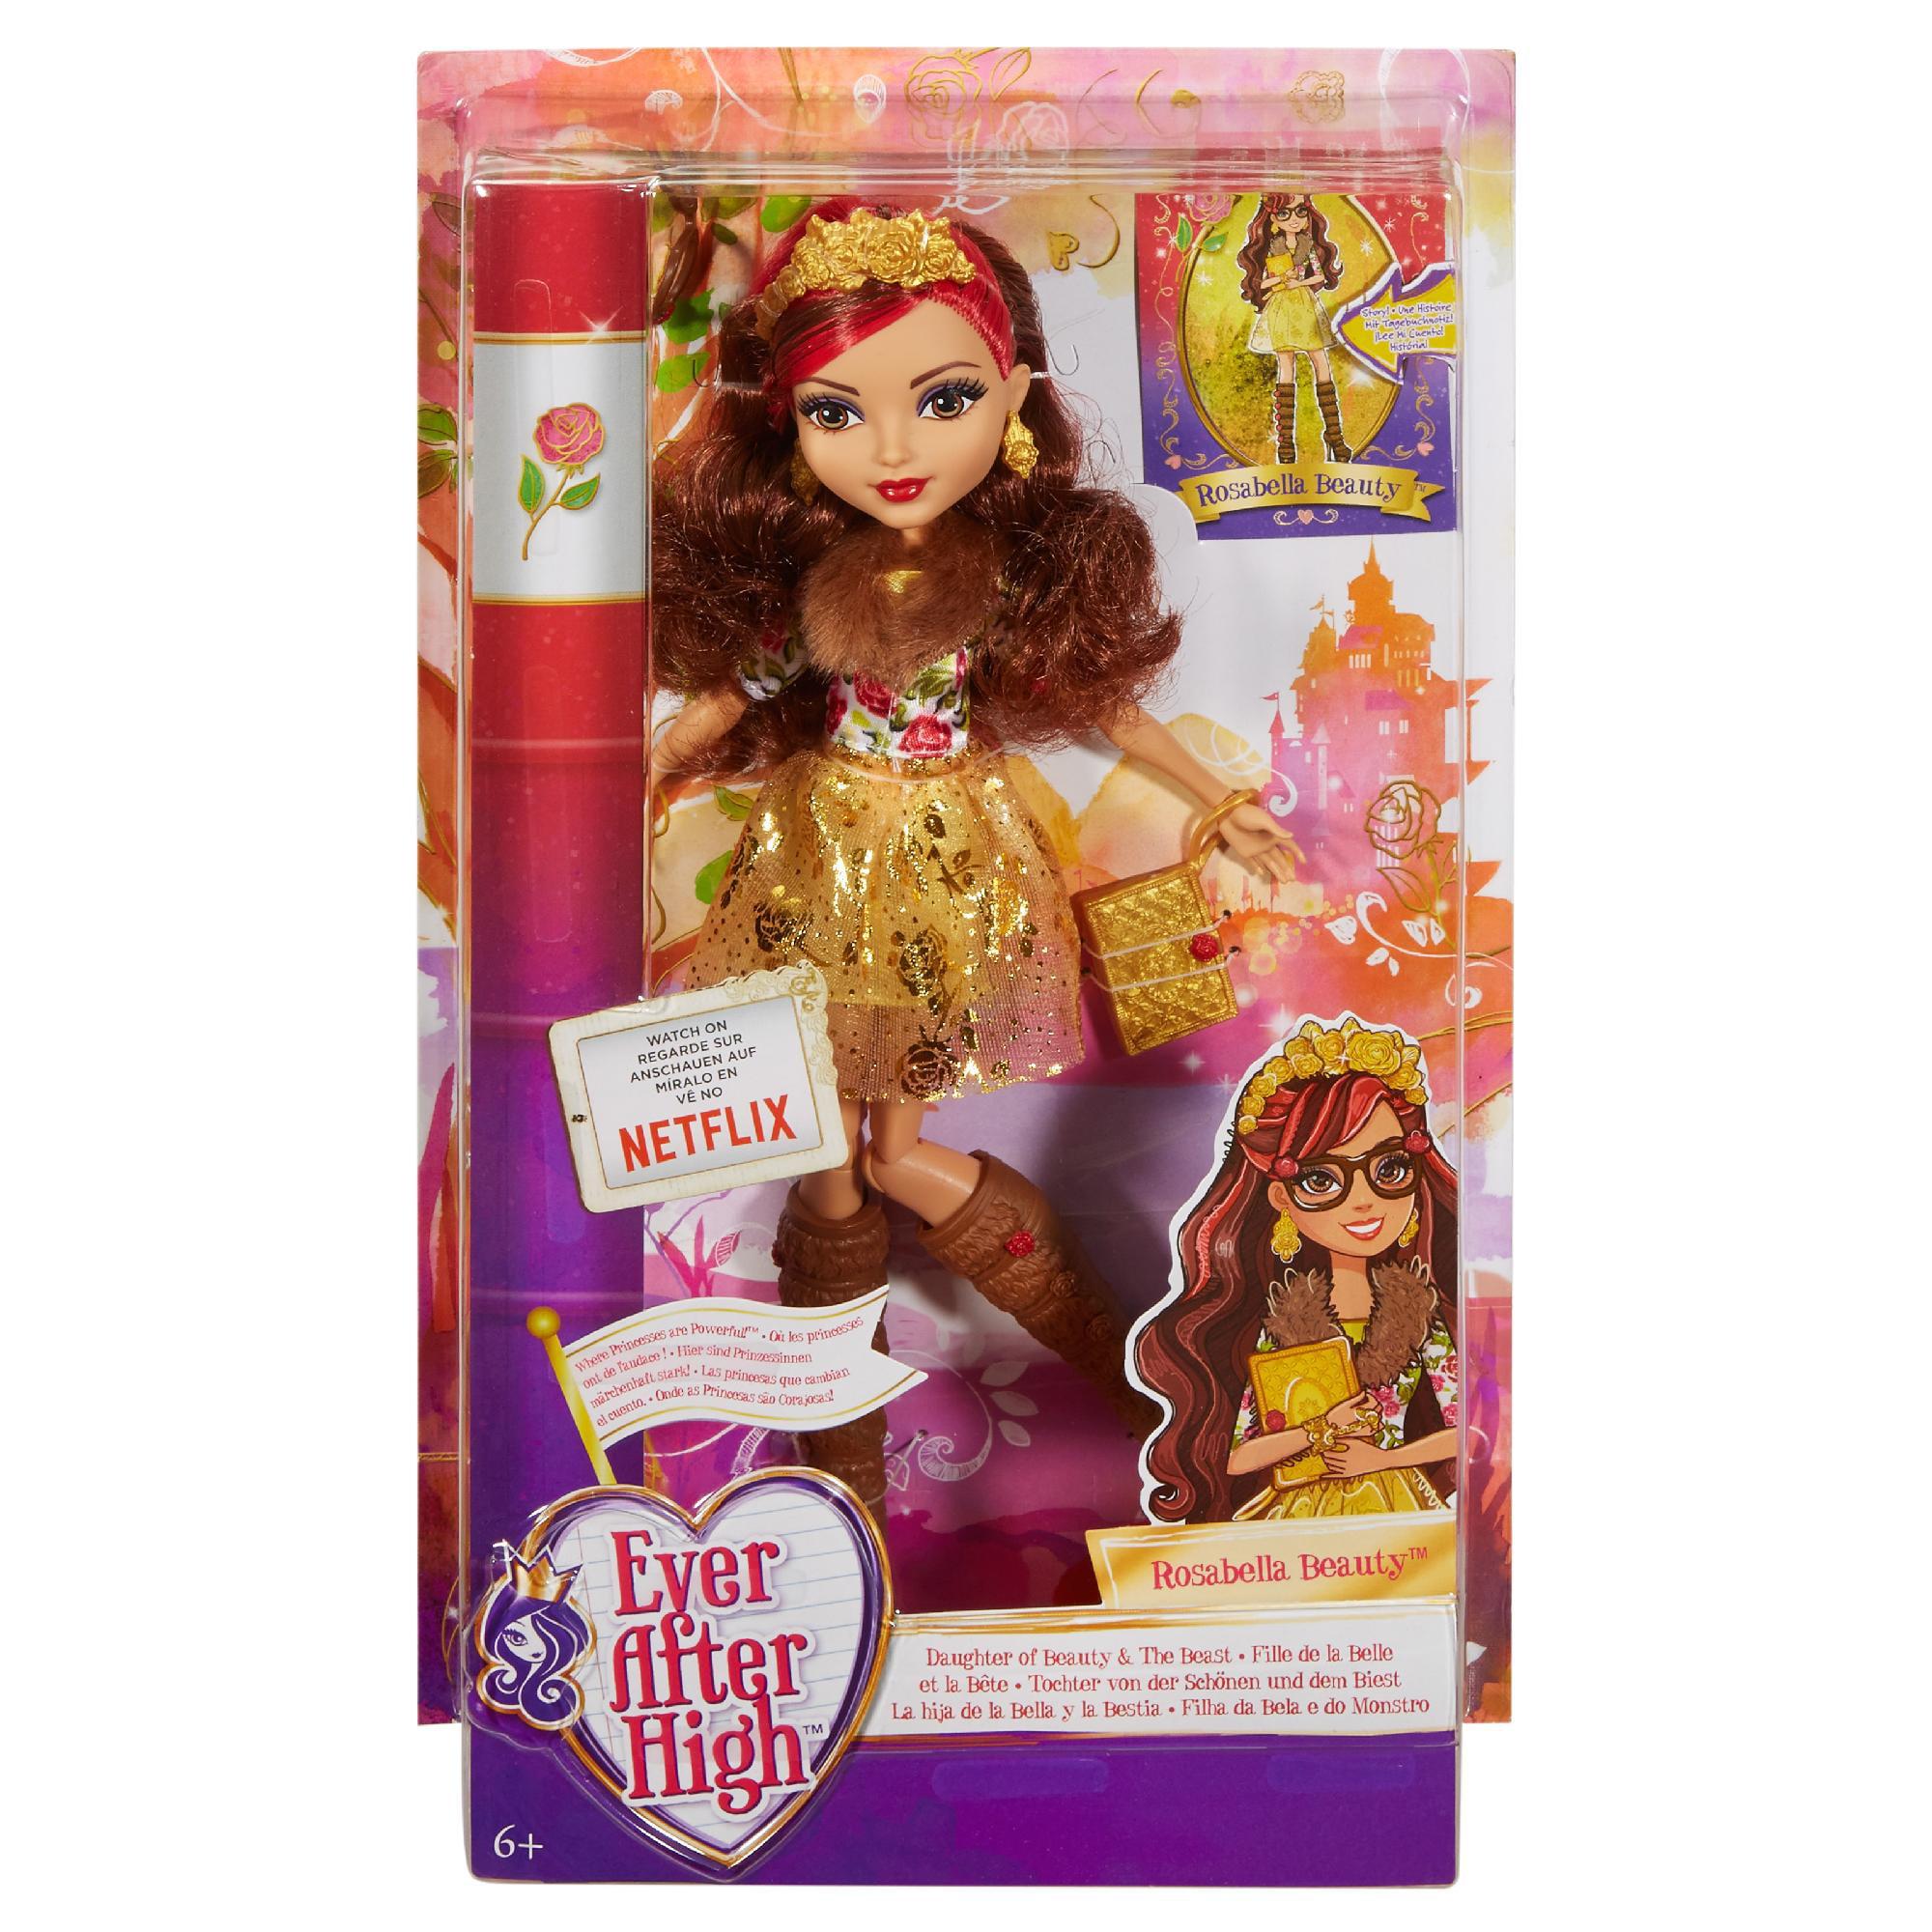 Ever After High Rosabella Beauty Doll  Walmartcom